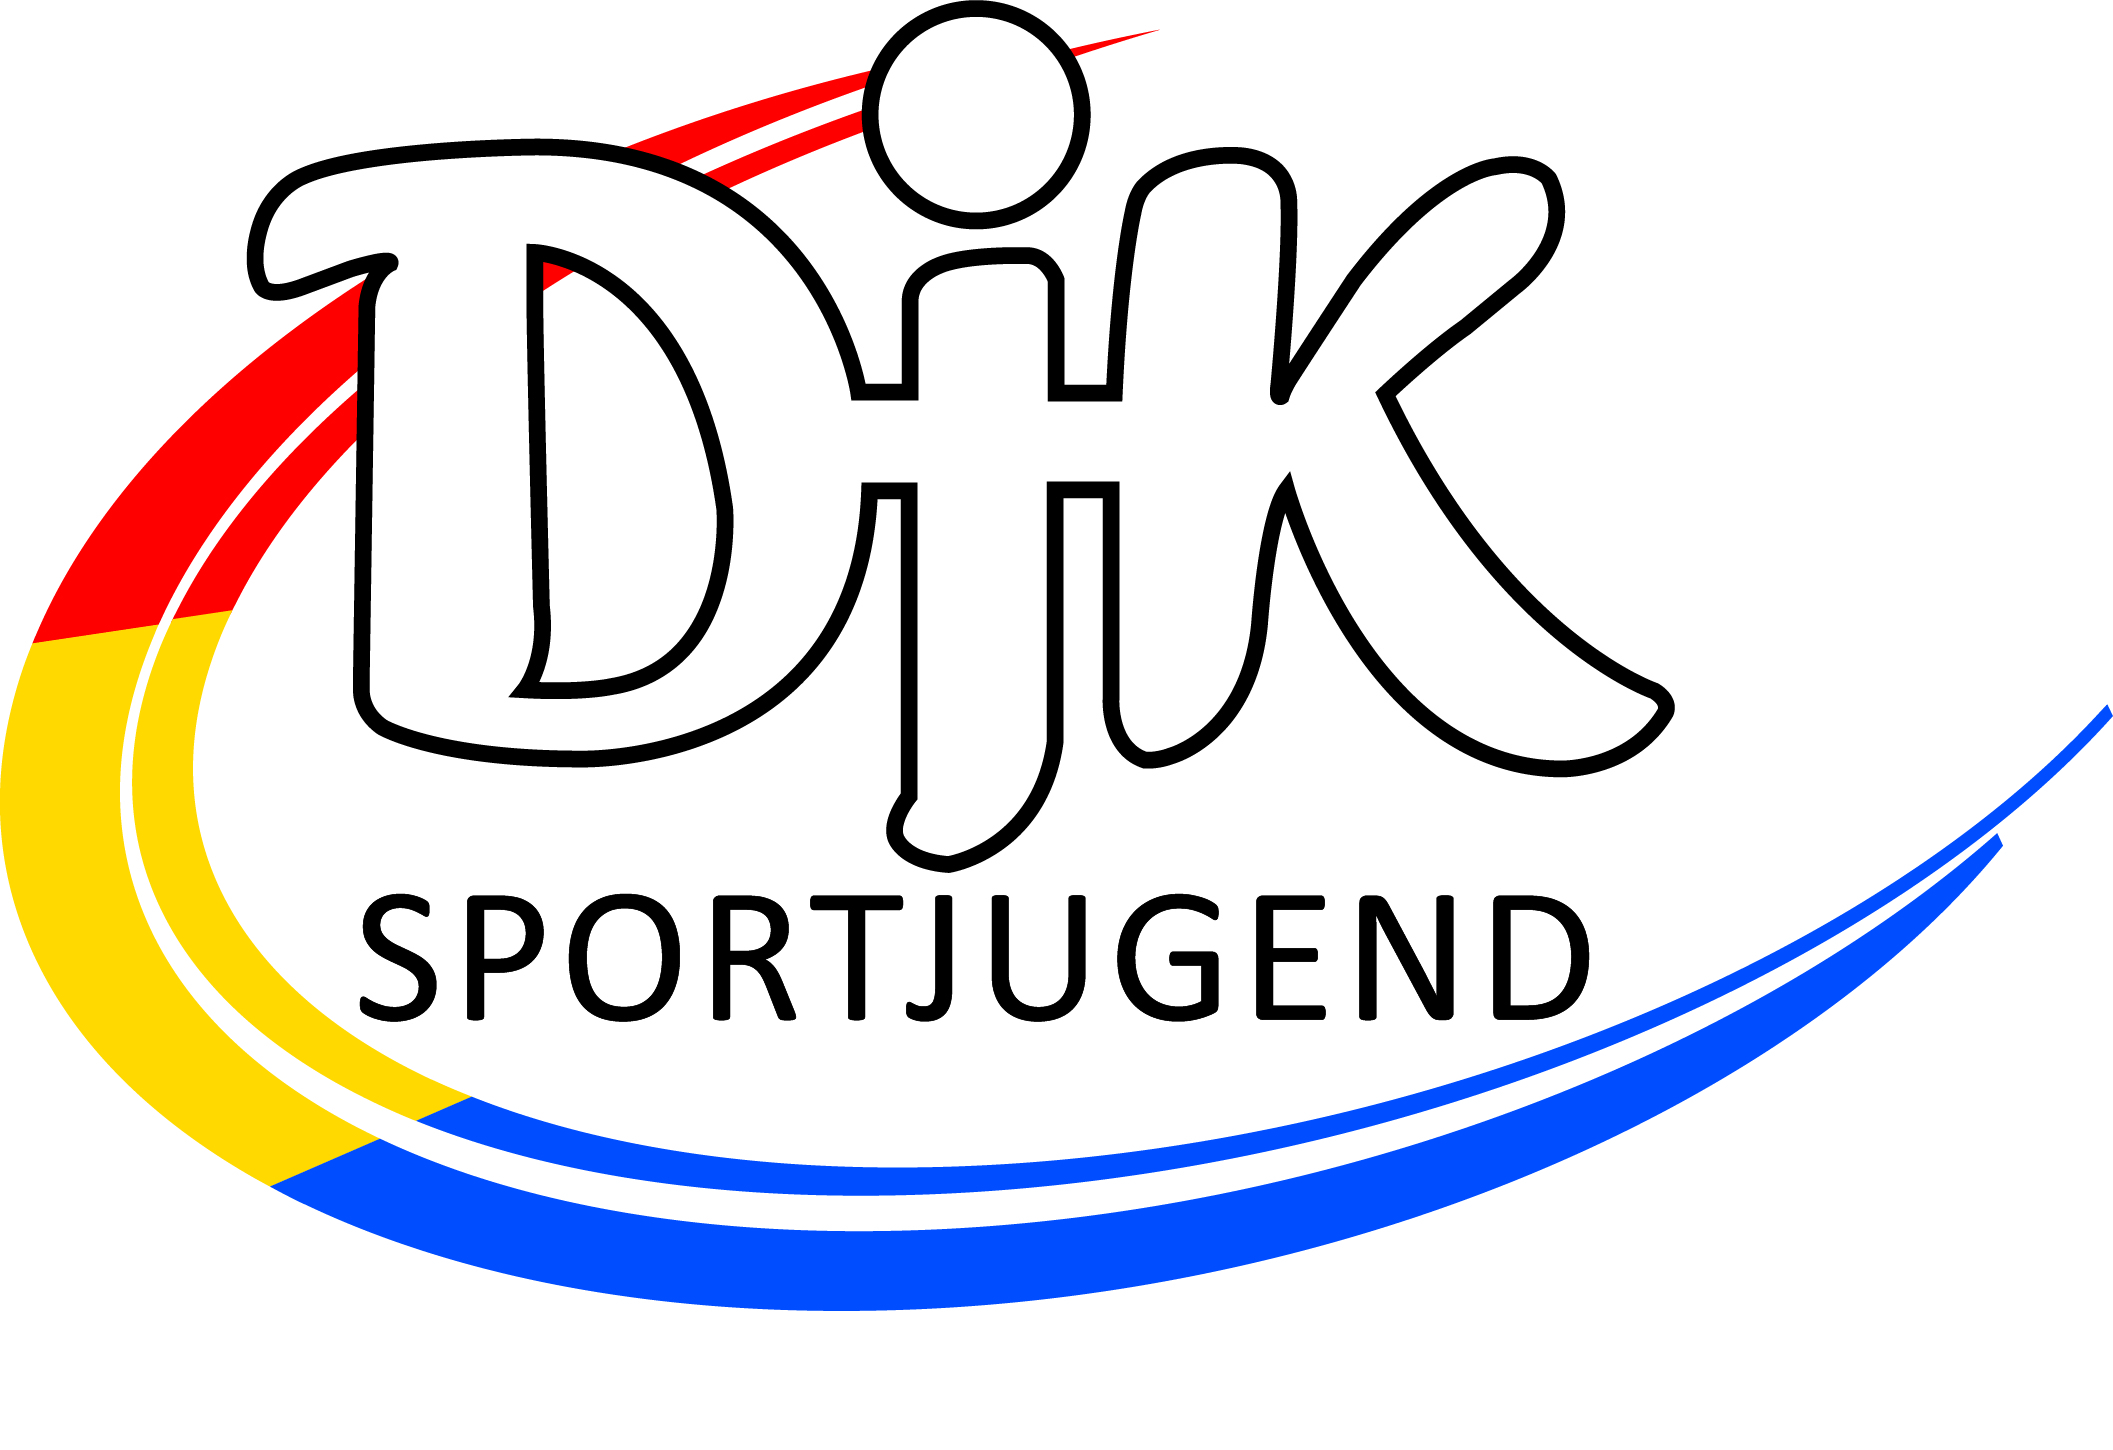 DJK Sportjugend